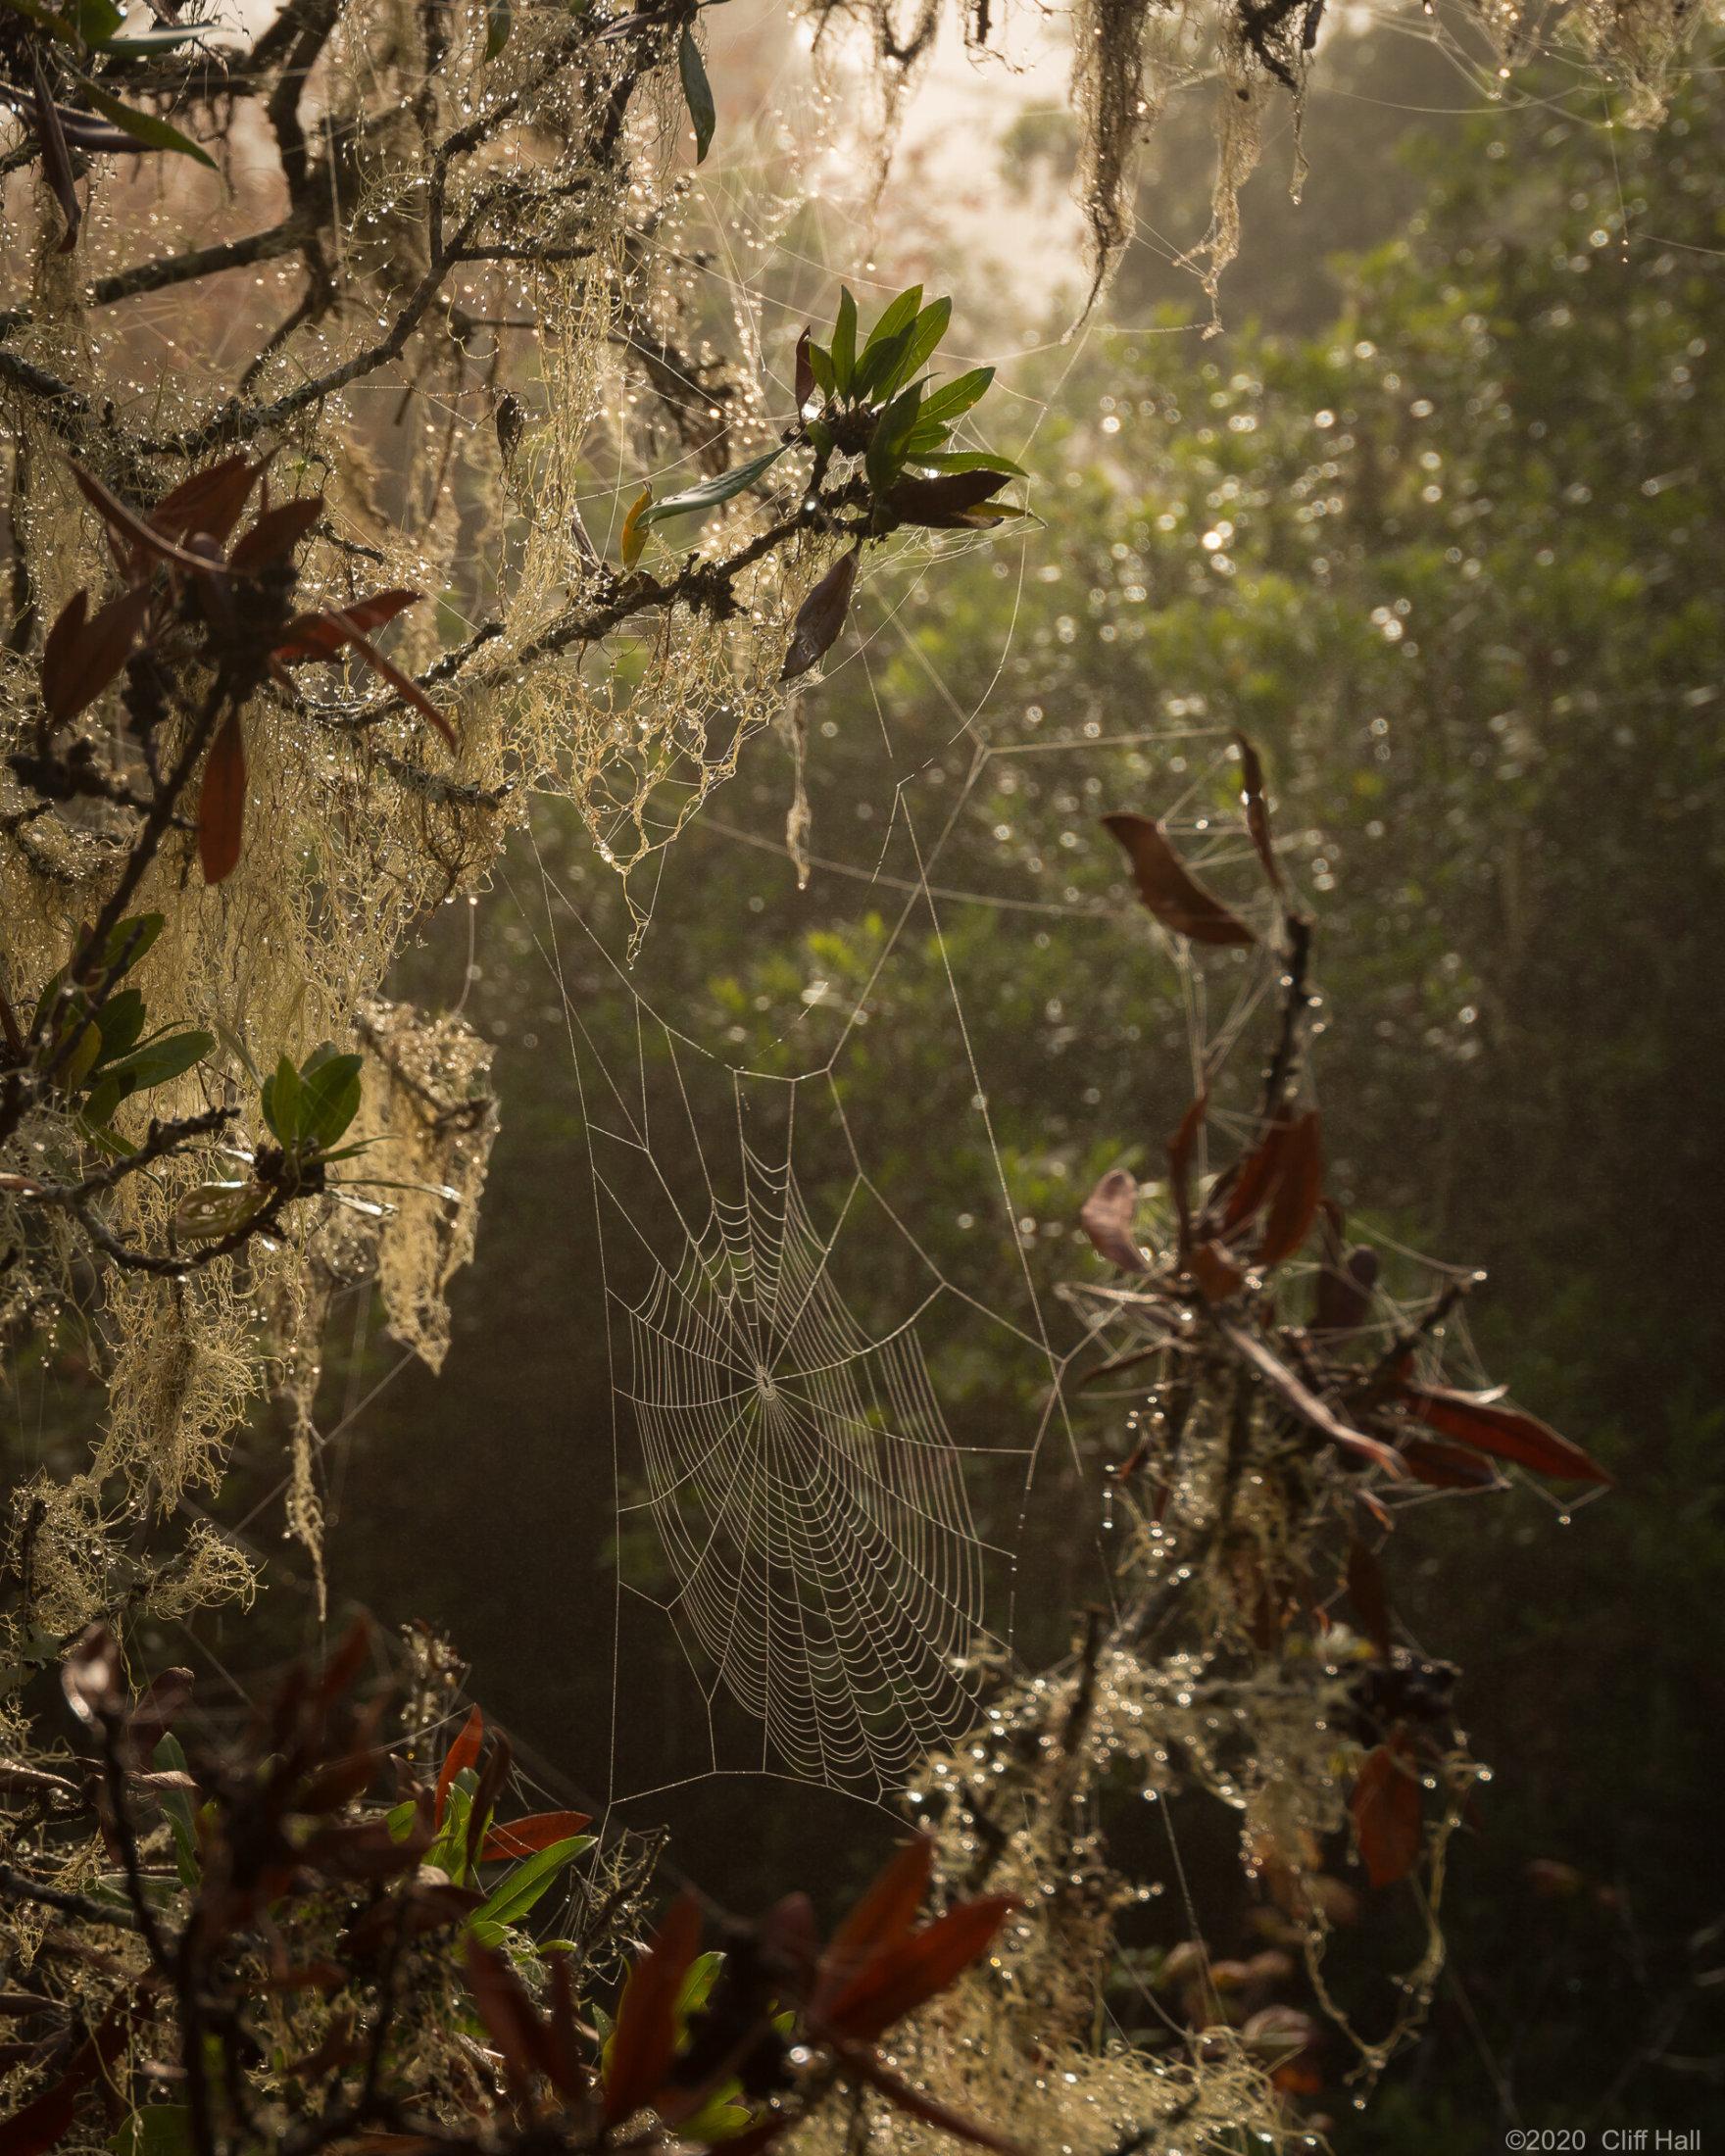 Web on a dewy morning